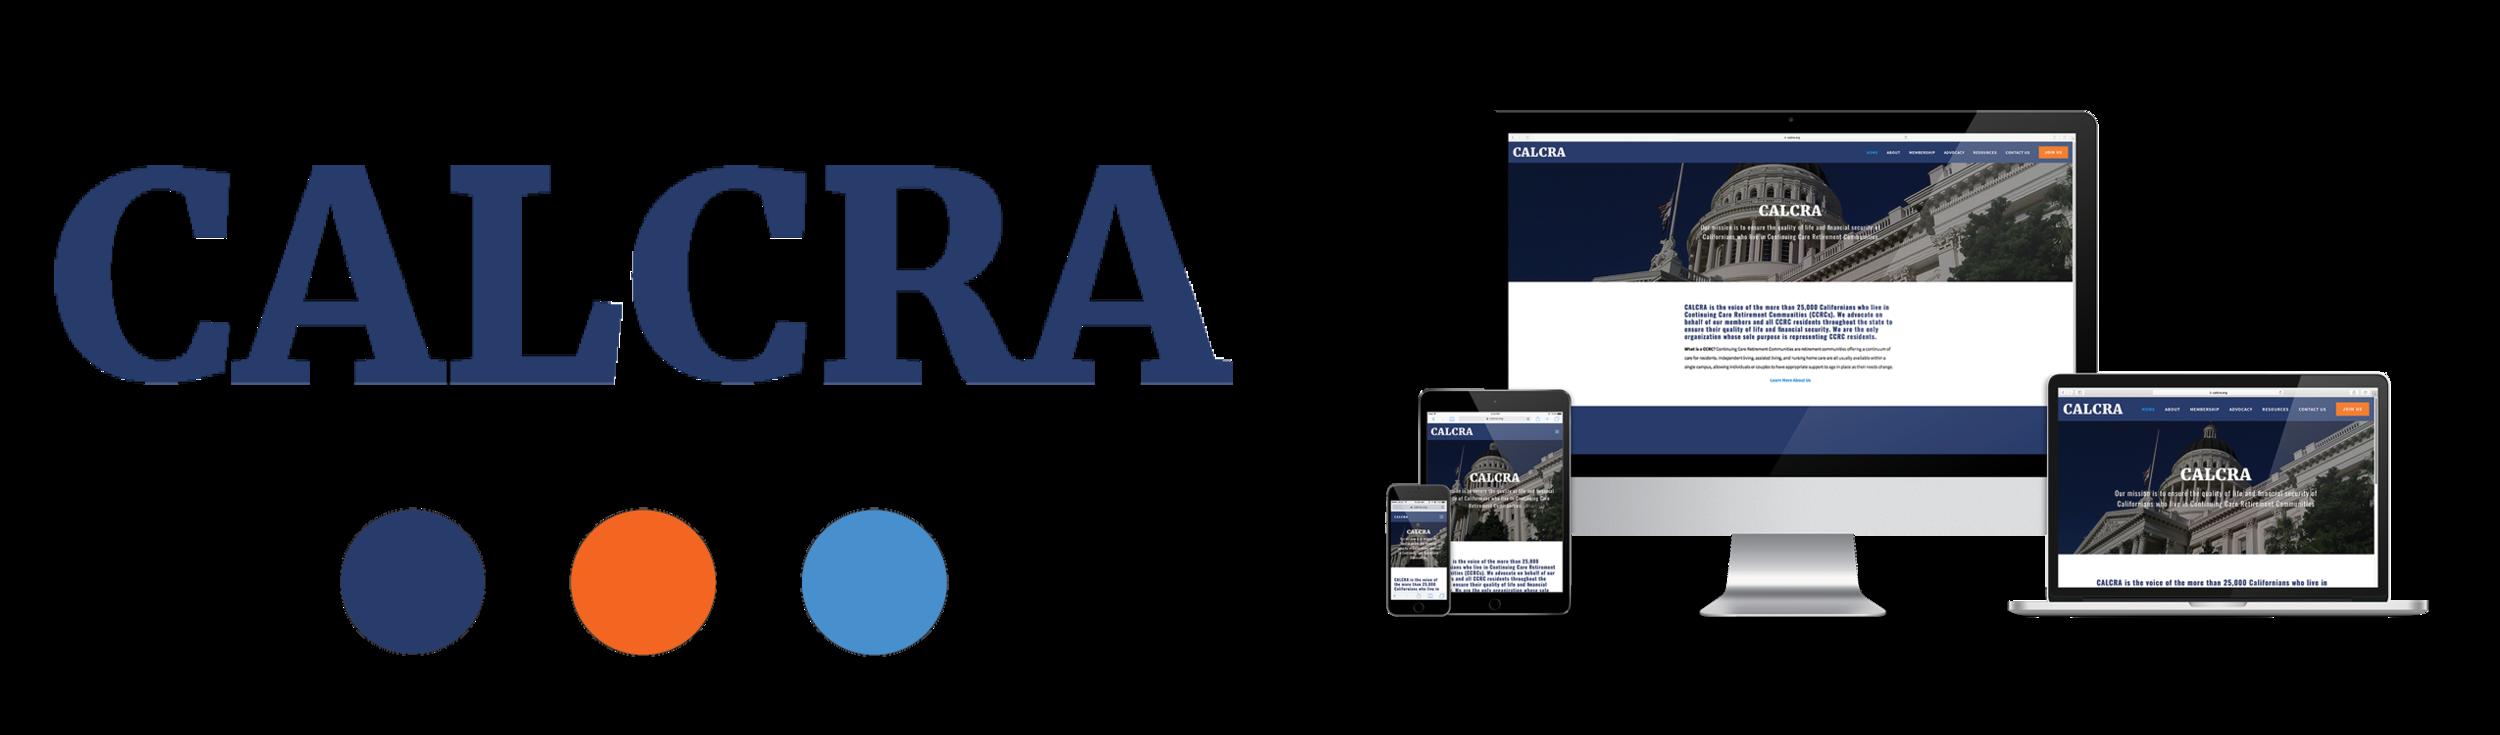 CALCRA website sample